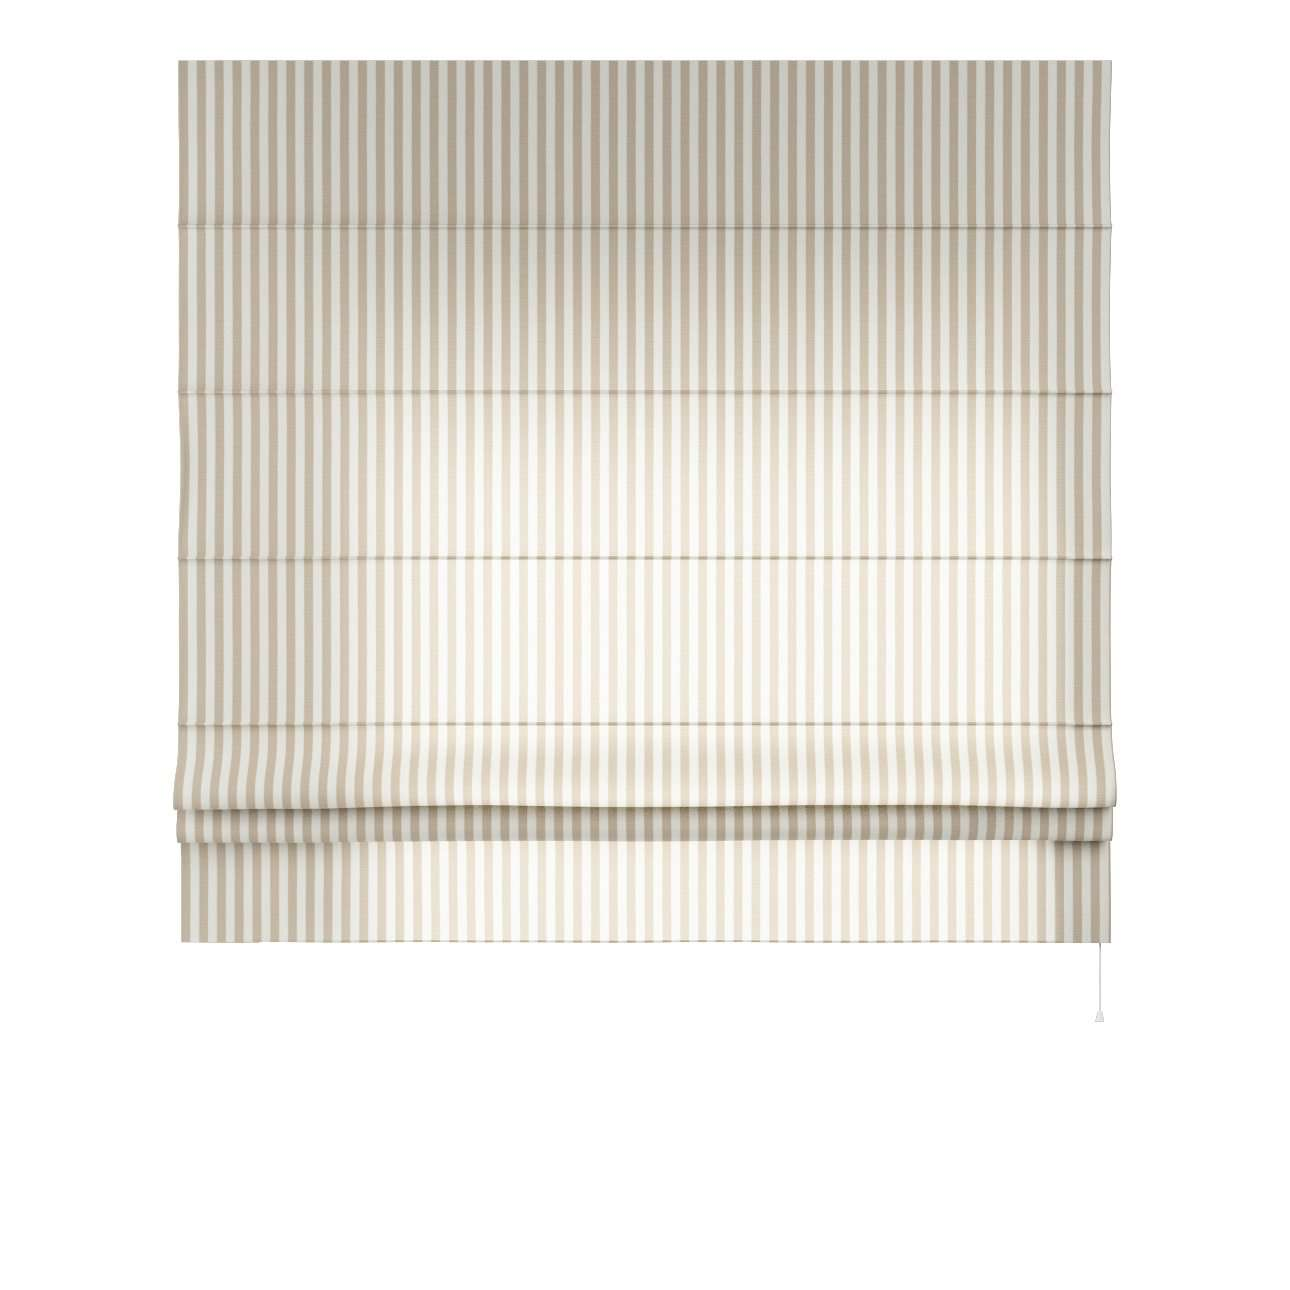 Padva roman blind  80 x 170 cm (31.5 x 67 inch) in collection Quadro, fabric: 136-07